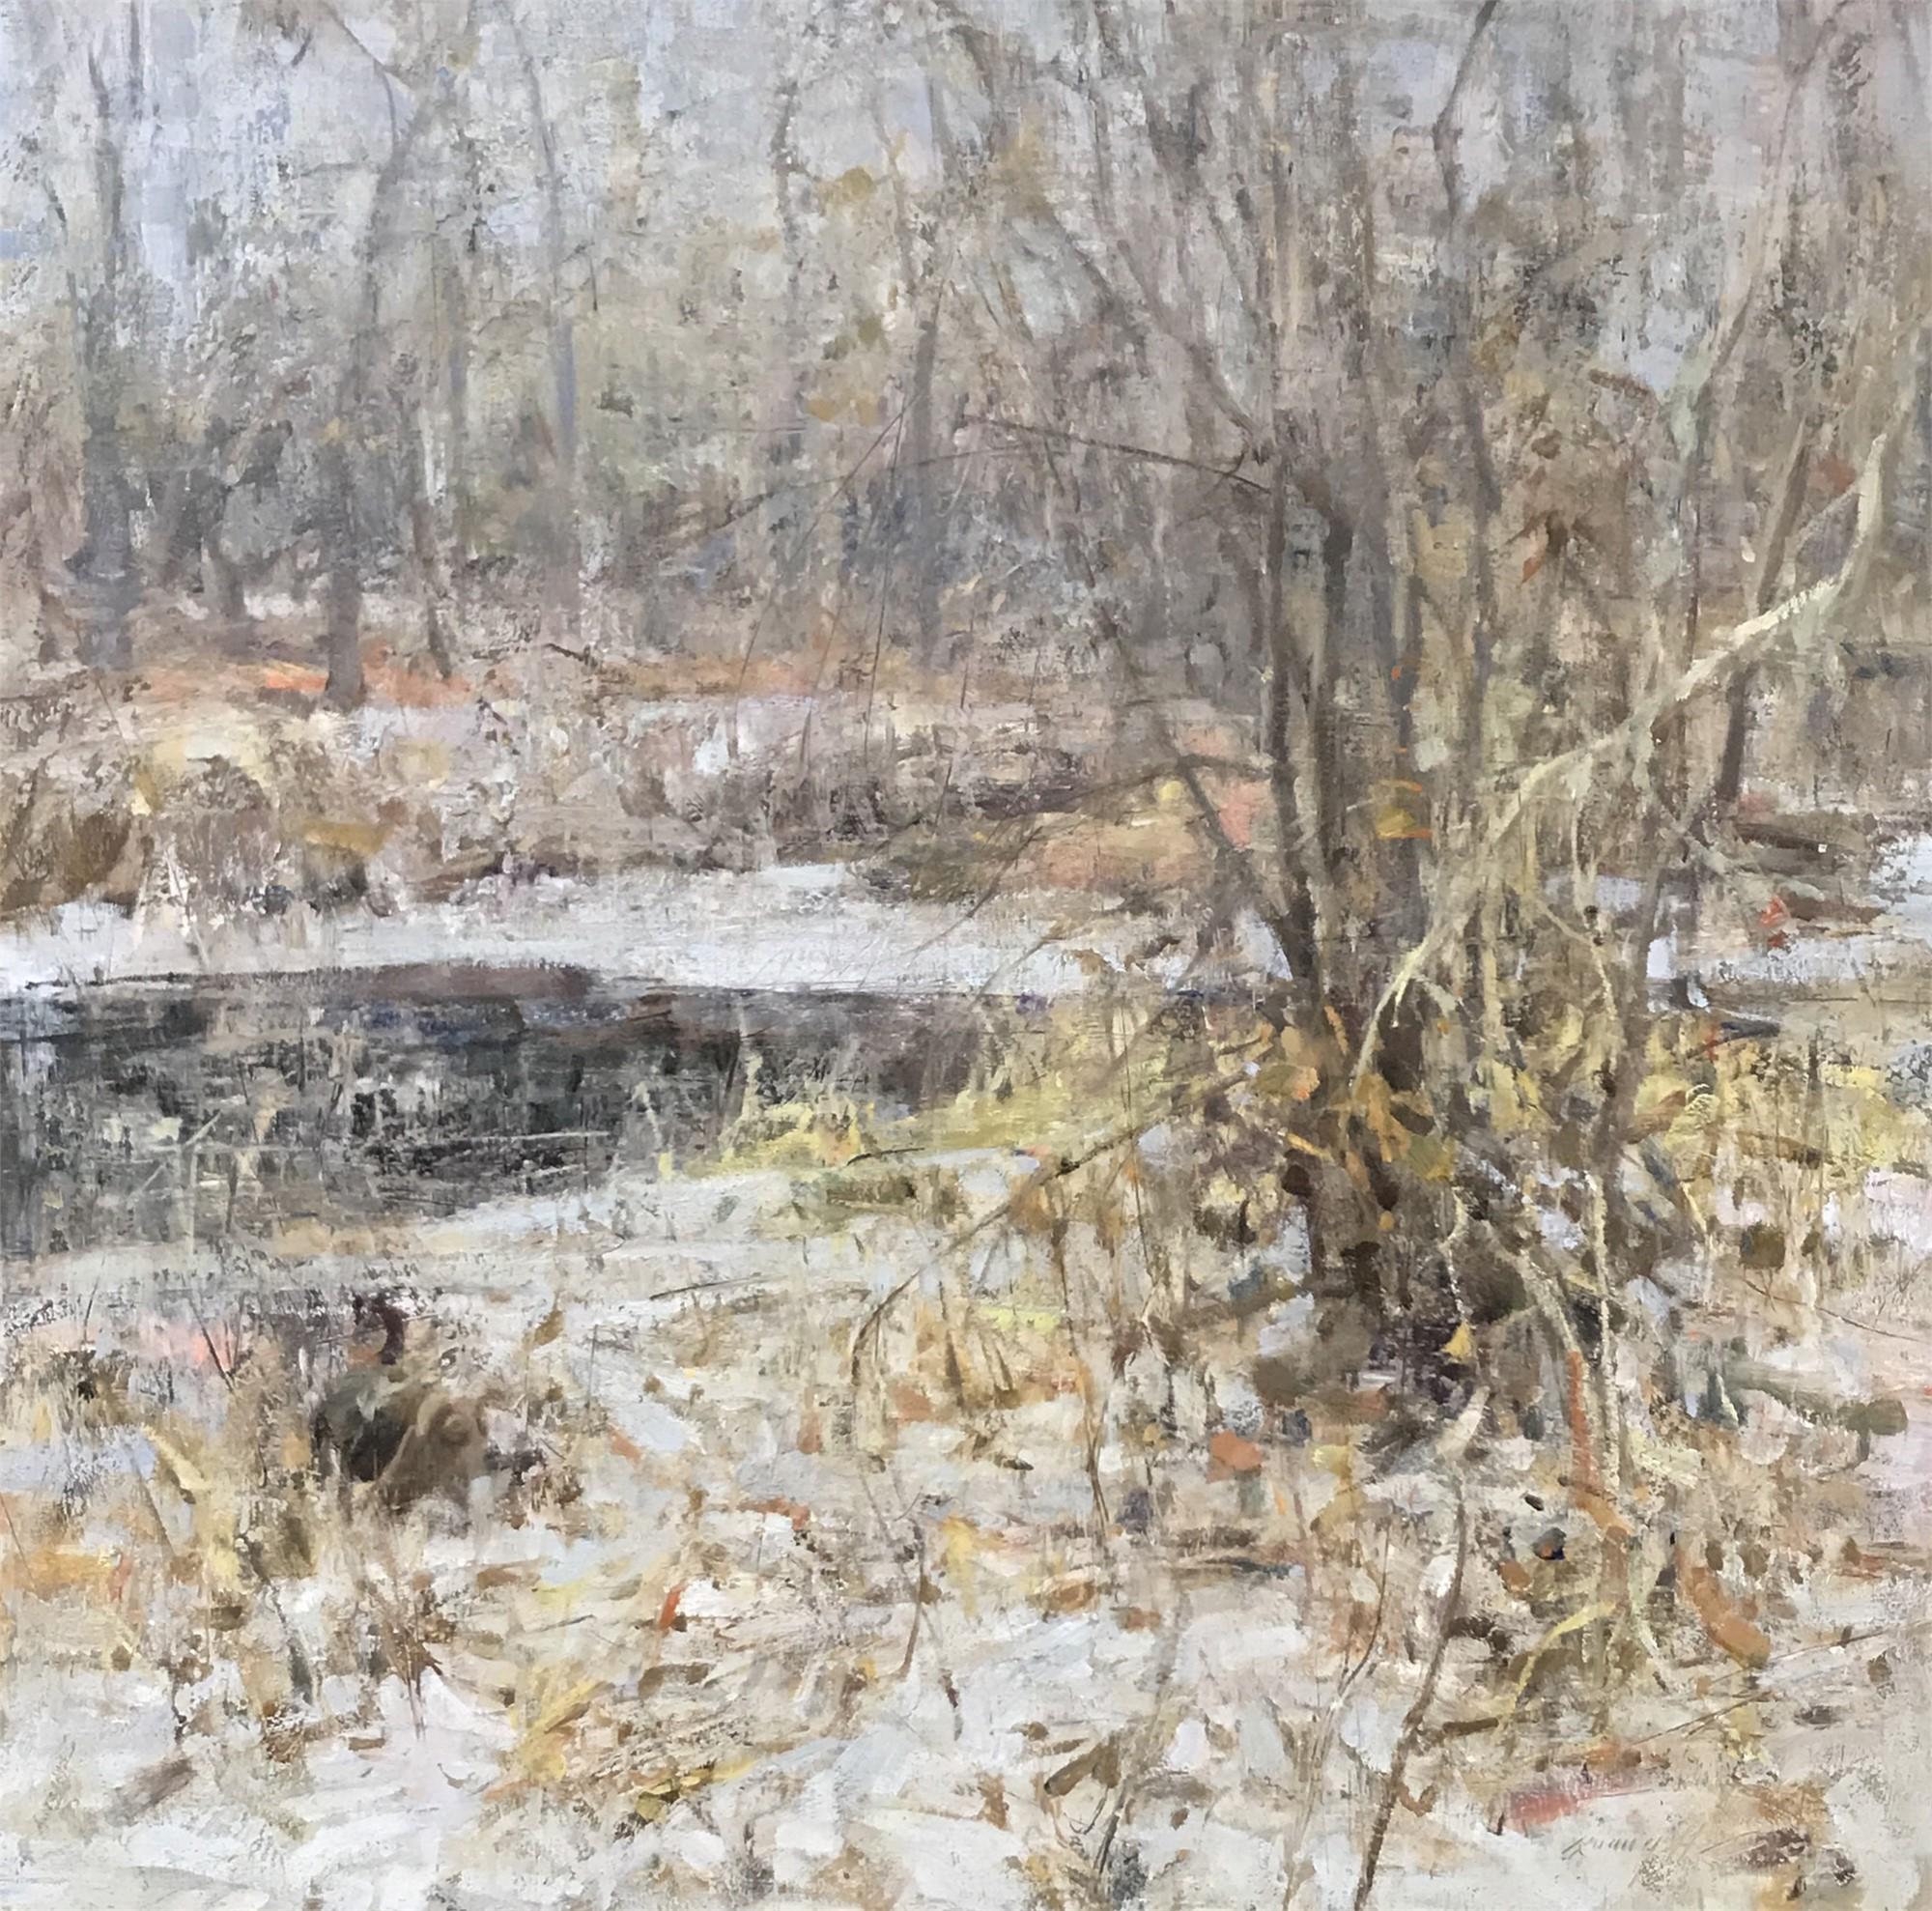 Winter Walk, Bear Creek by Quang Ho